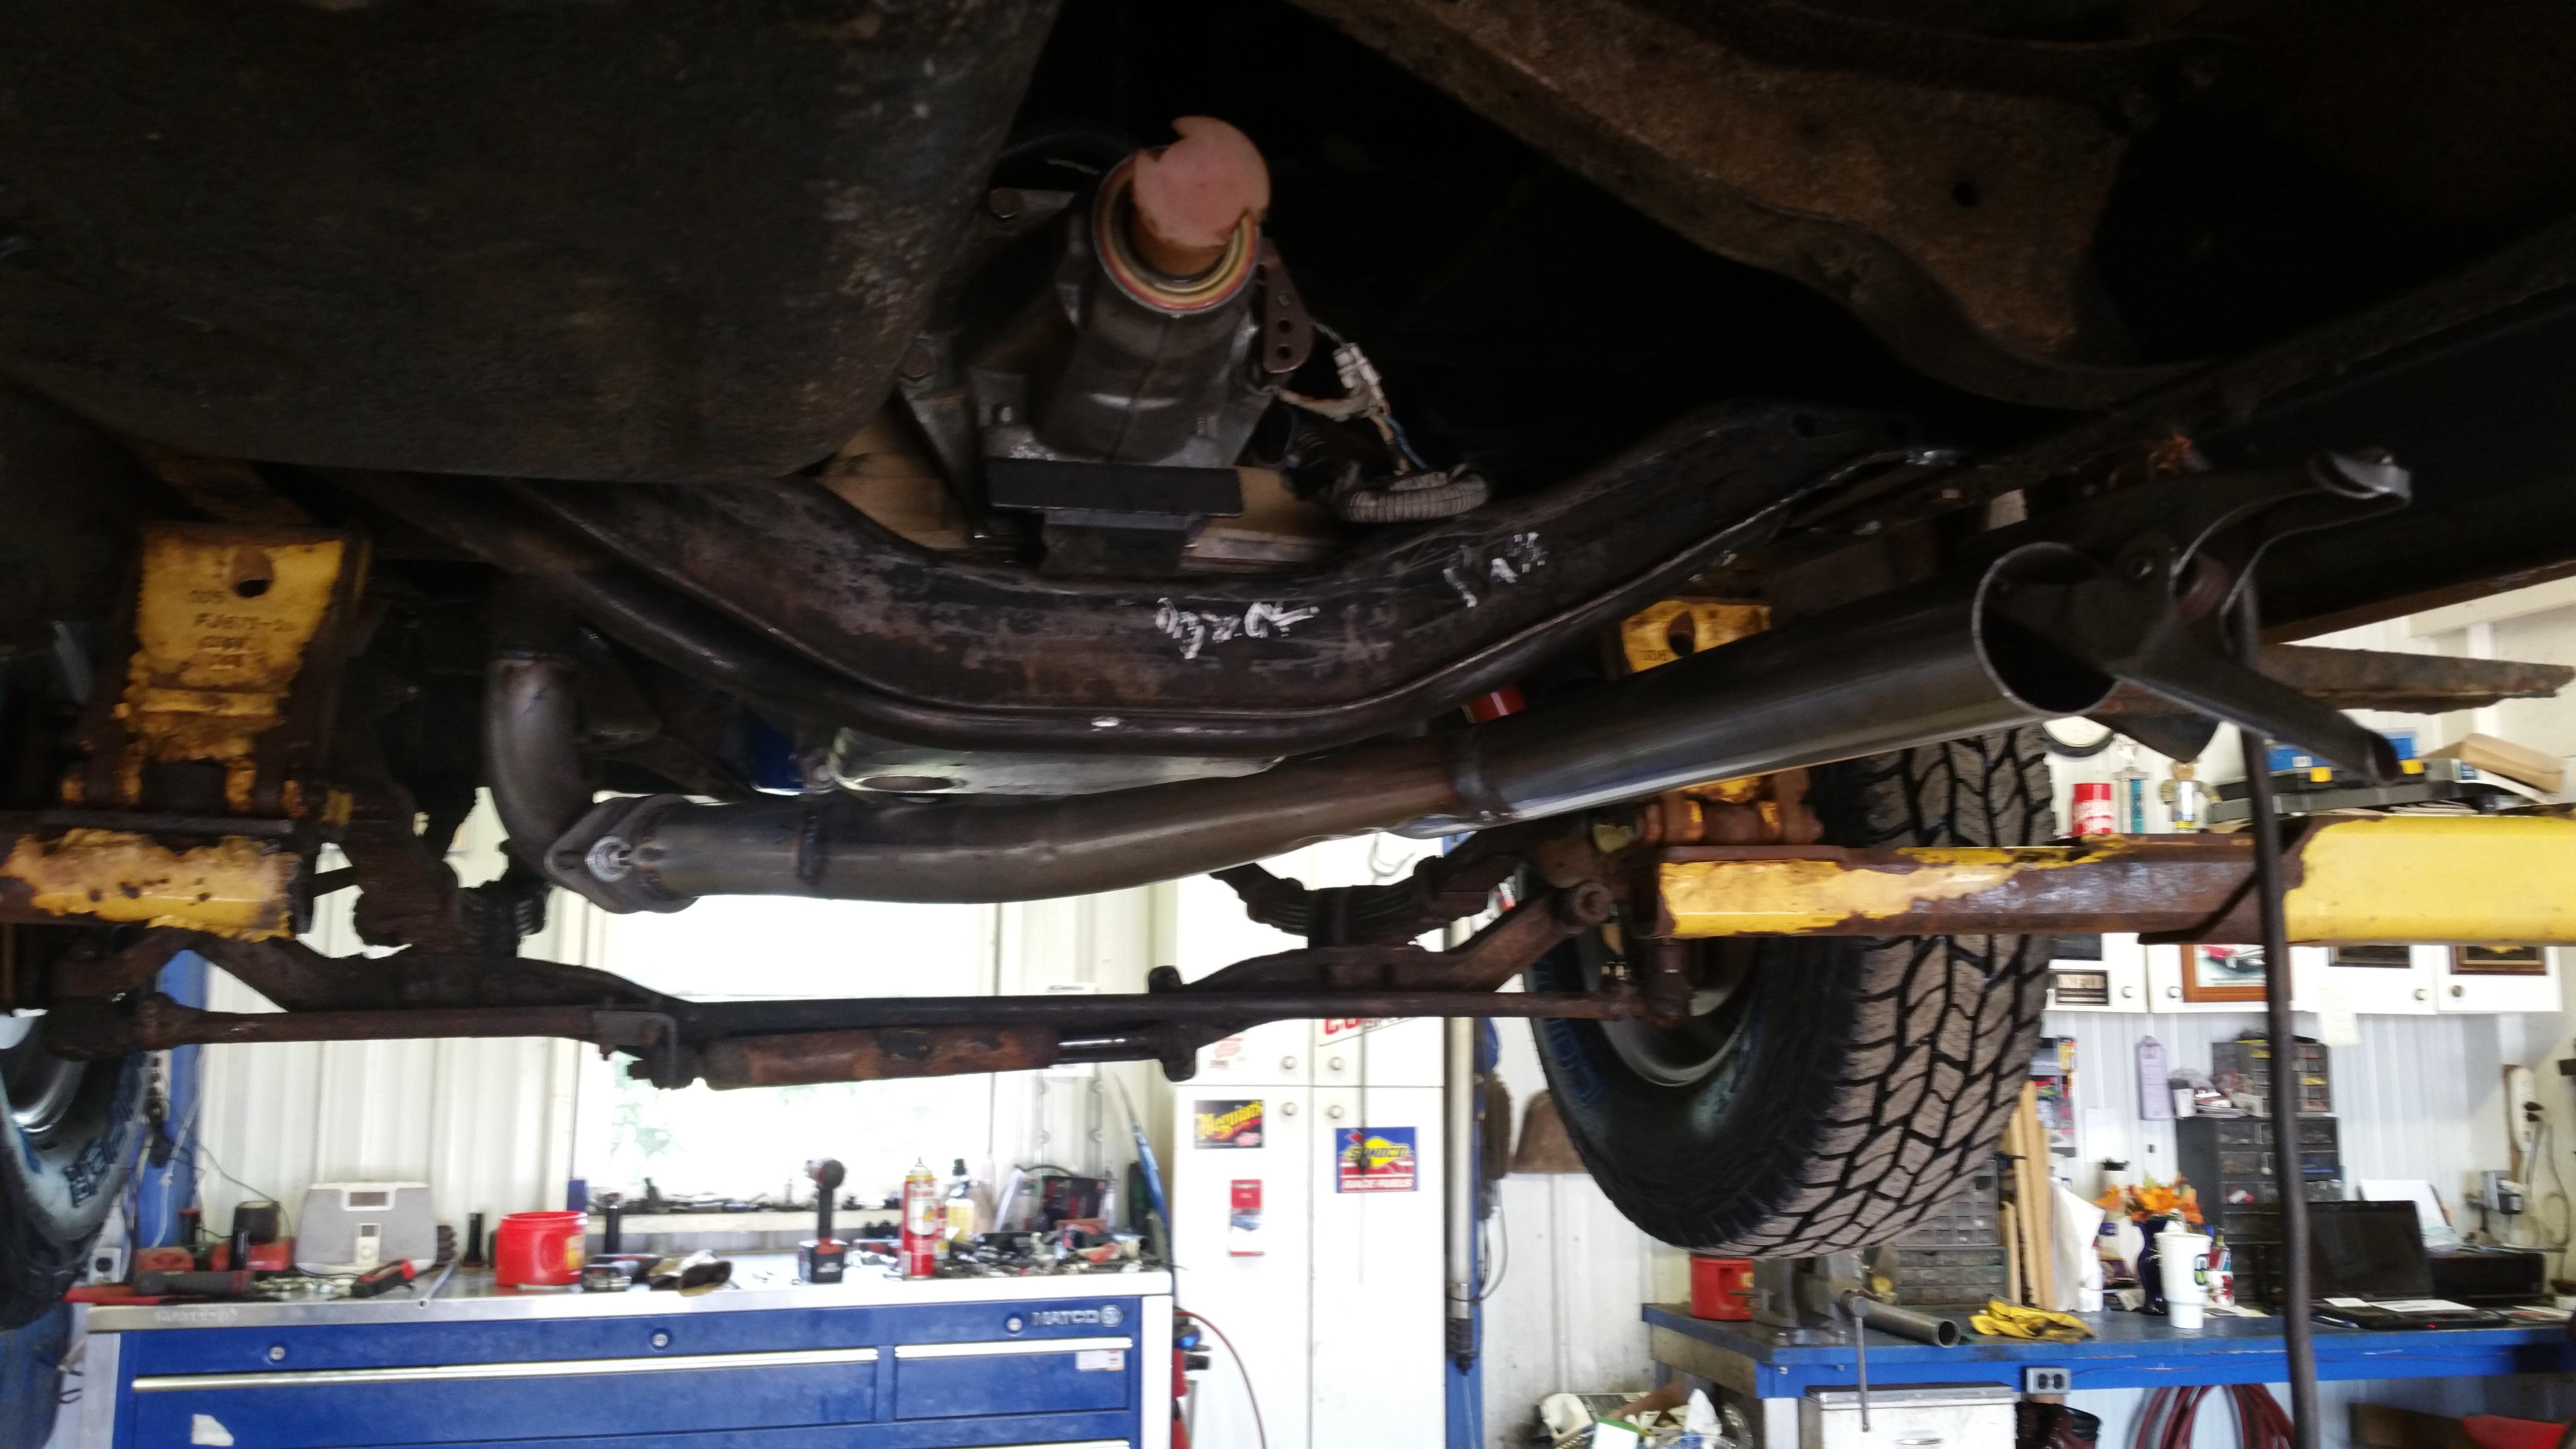 O 39 connor auto repair in portland mi 48875 for Electric motor repair portland oregon